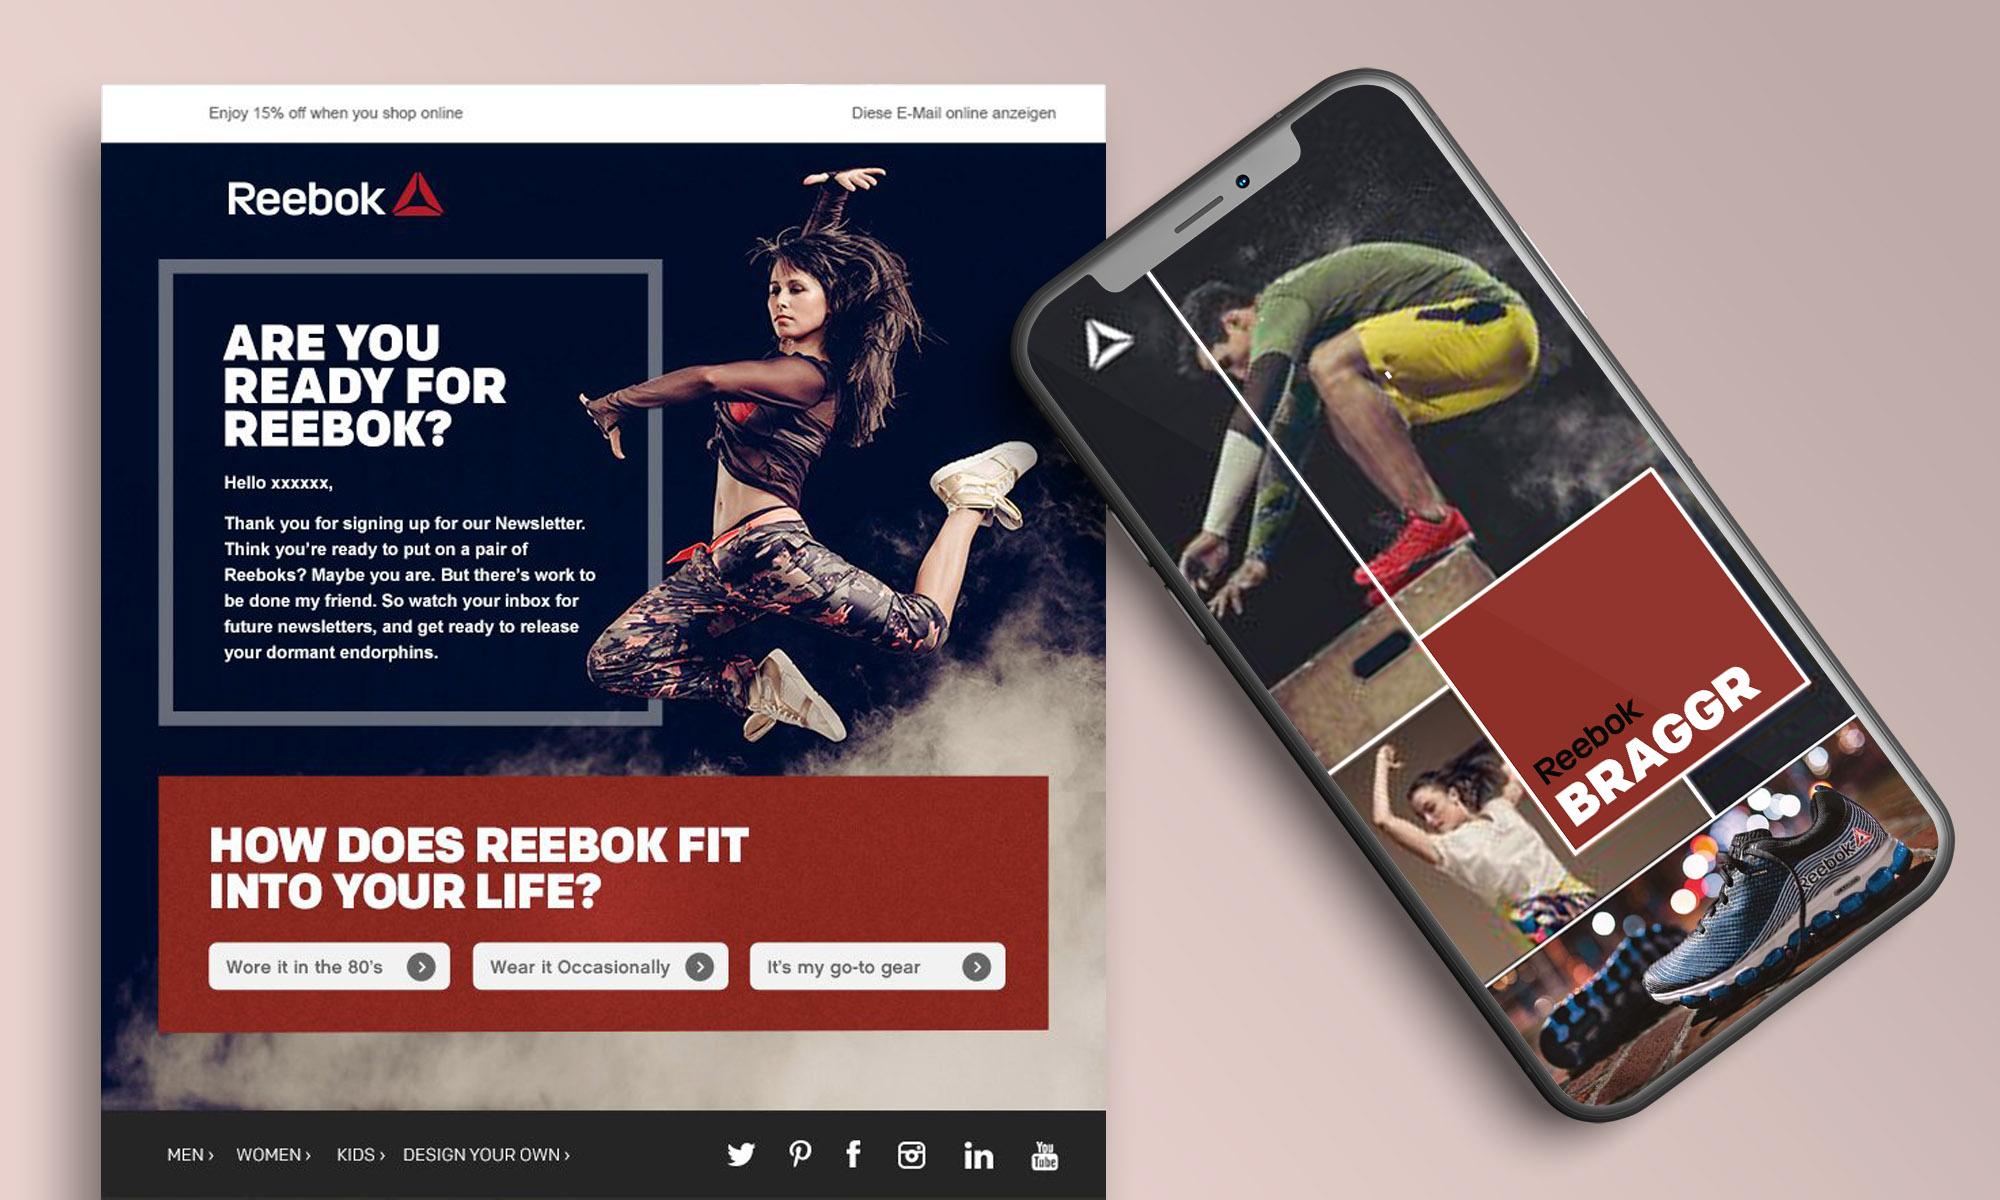 Reebok Onboarding Email and Website Design